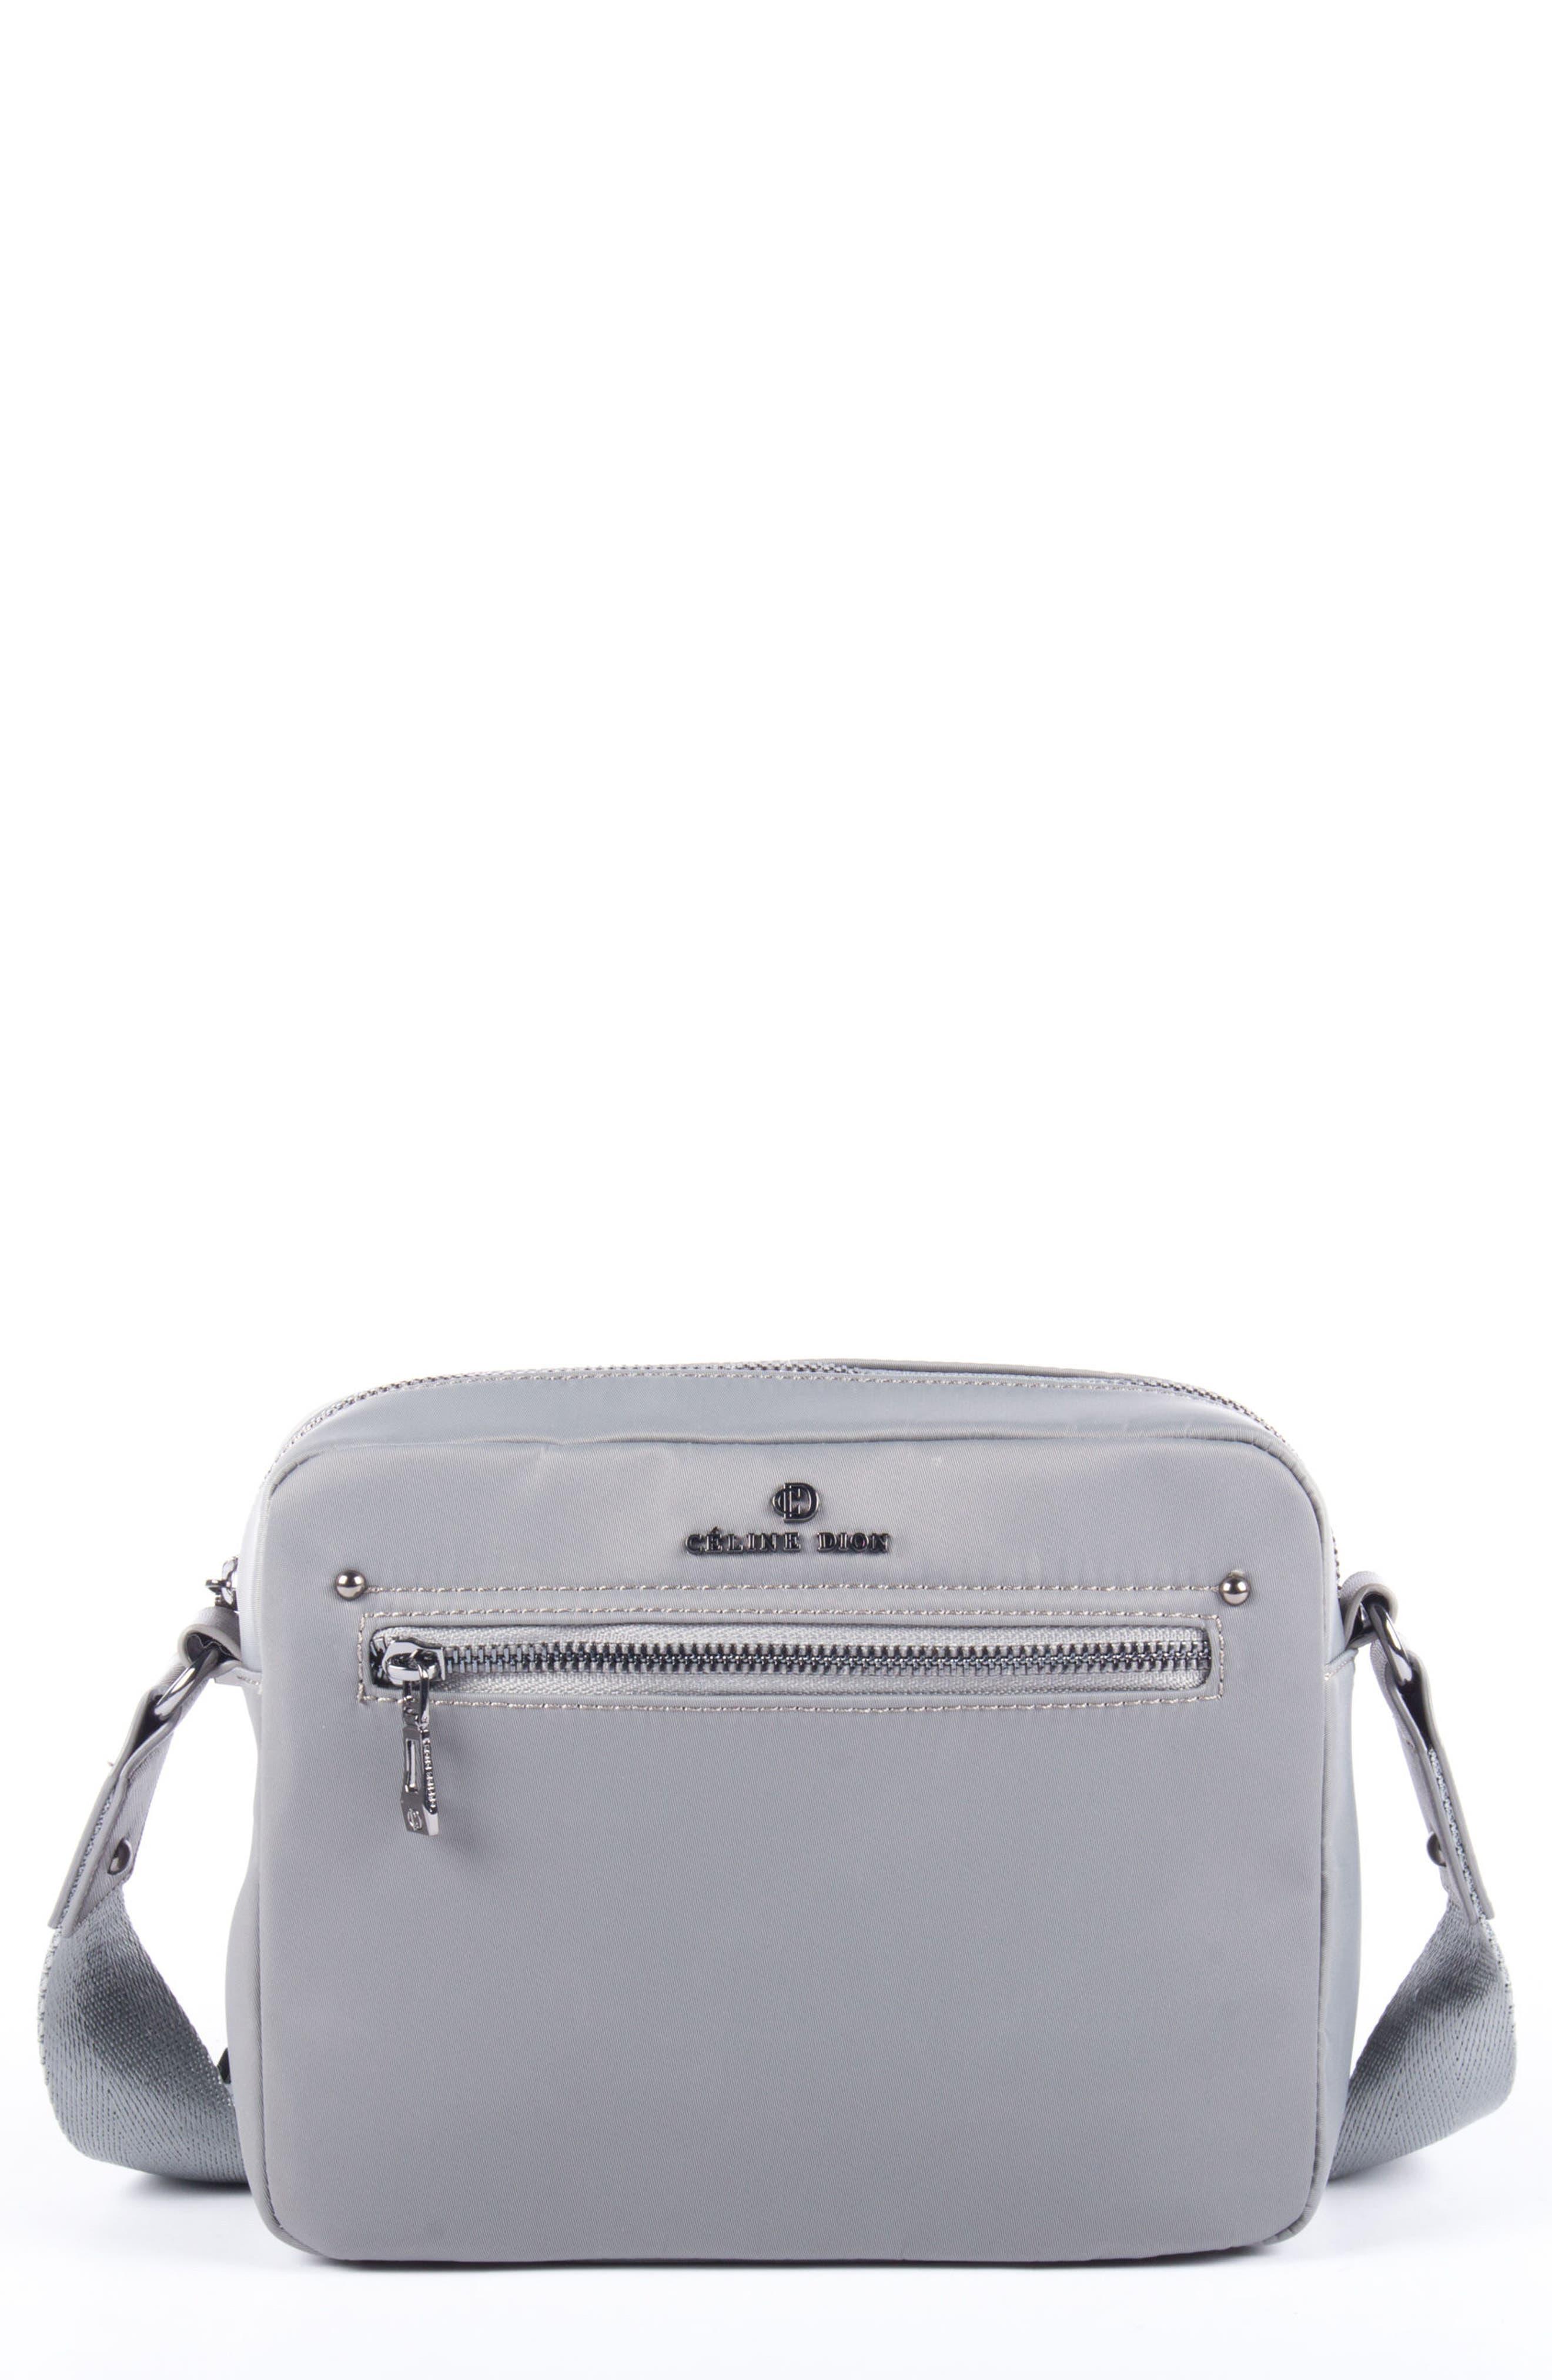 Céline Dion Presto Nylon Crossbody Bag,                             Main thumbnail 1, color,                             Grey